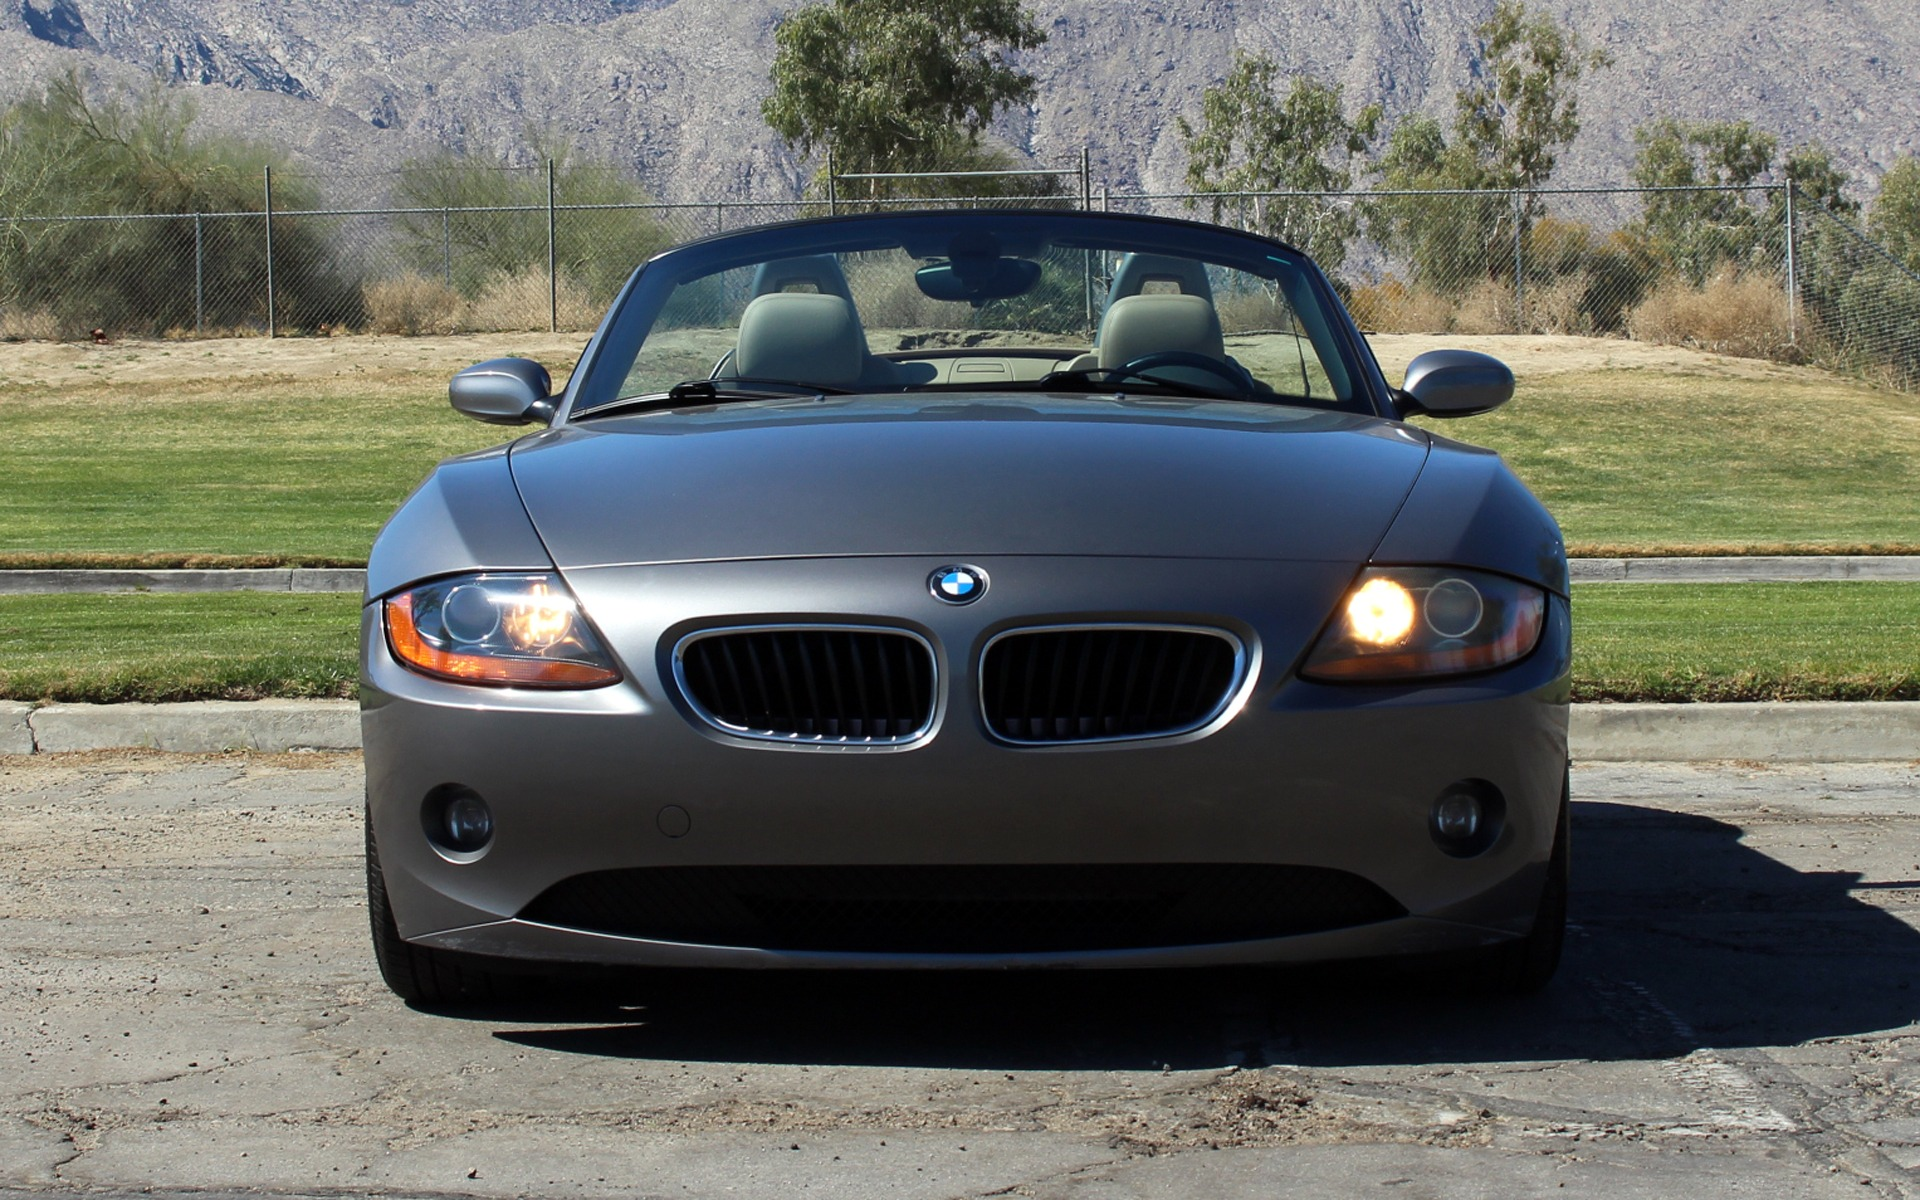 2003 Bmw Z4 2 5i Stock Bm156 For Sale Near Palm Springs Ca Ca Bmw Dealer